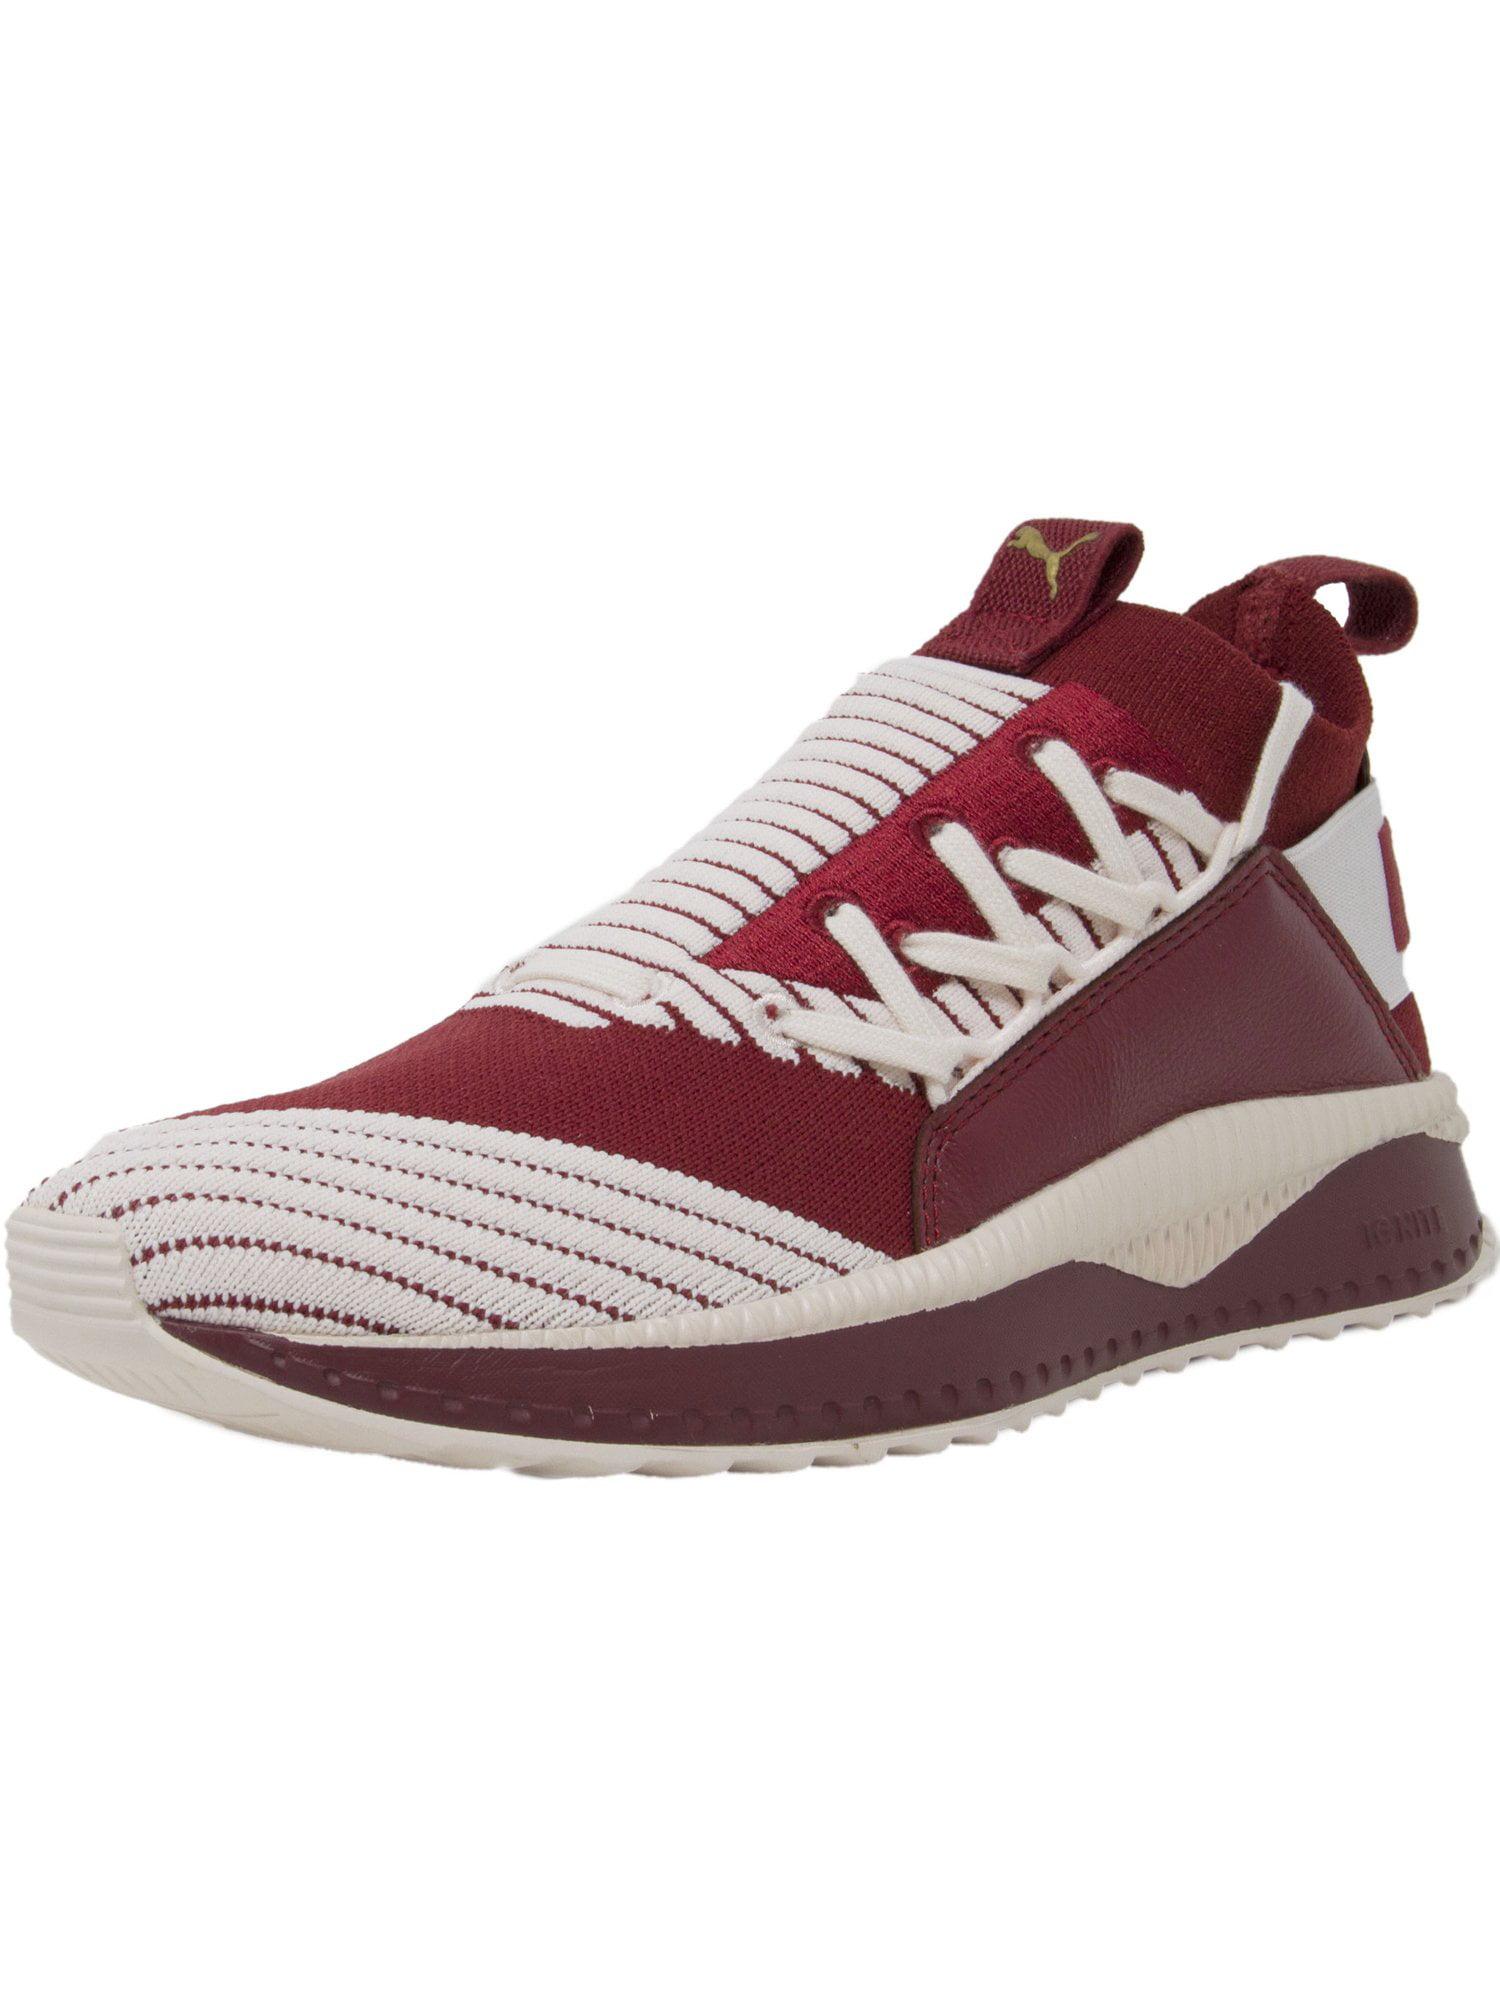 Women's Tsugi Jun Red Dahlia / Pearl Ankle-High Walking Shoe - 7M